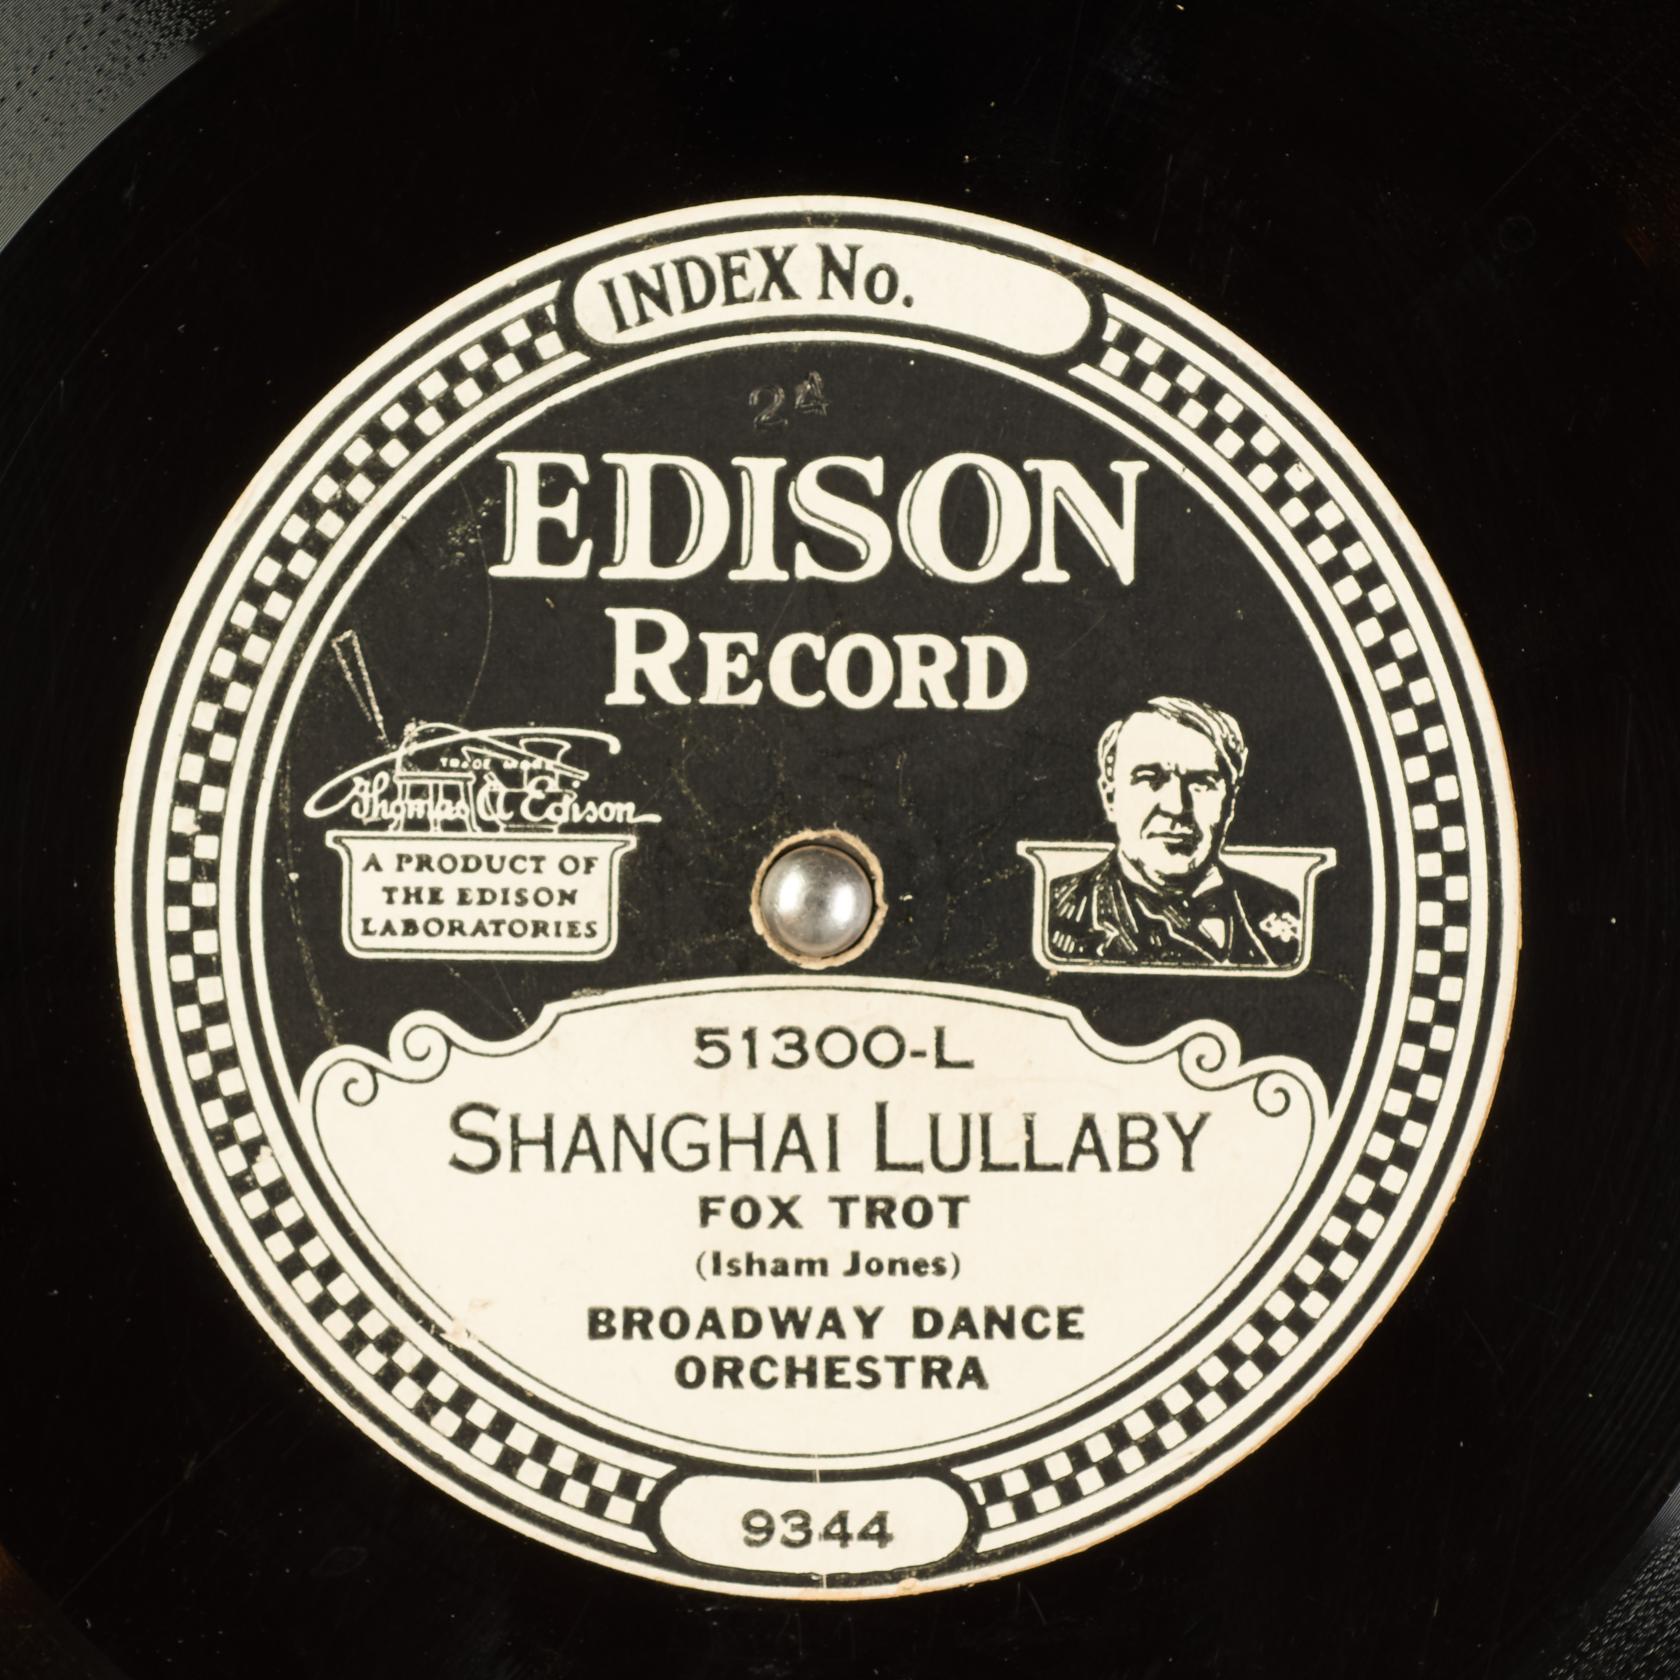 78_shanghai-lullaby_broadway-dance-orchestra-isham-jones_gbia0083243a_itemimage.jpg